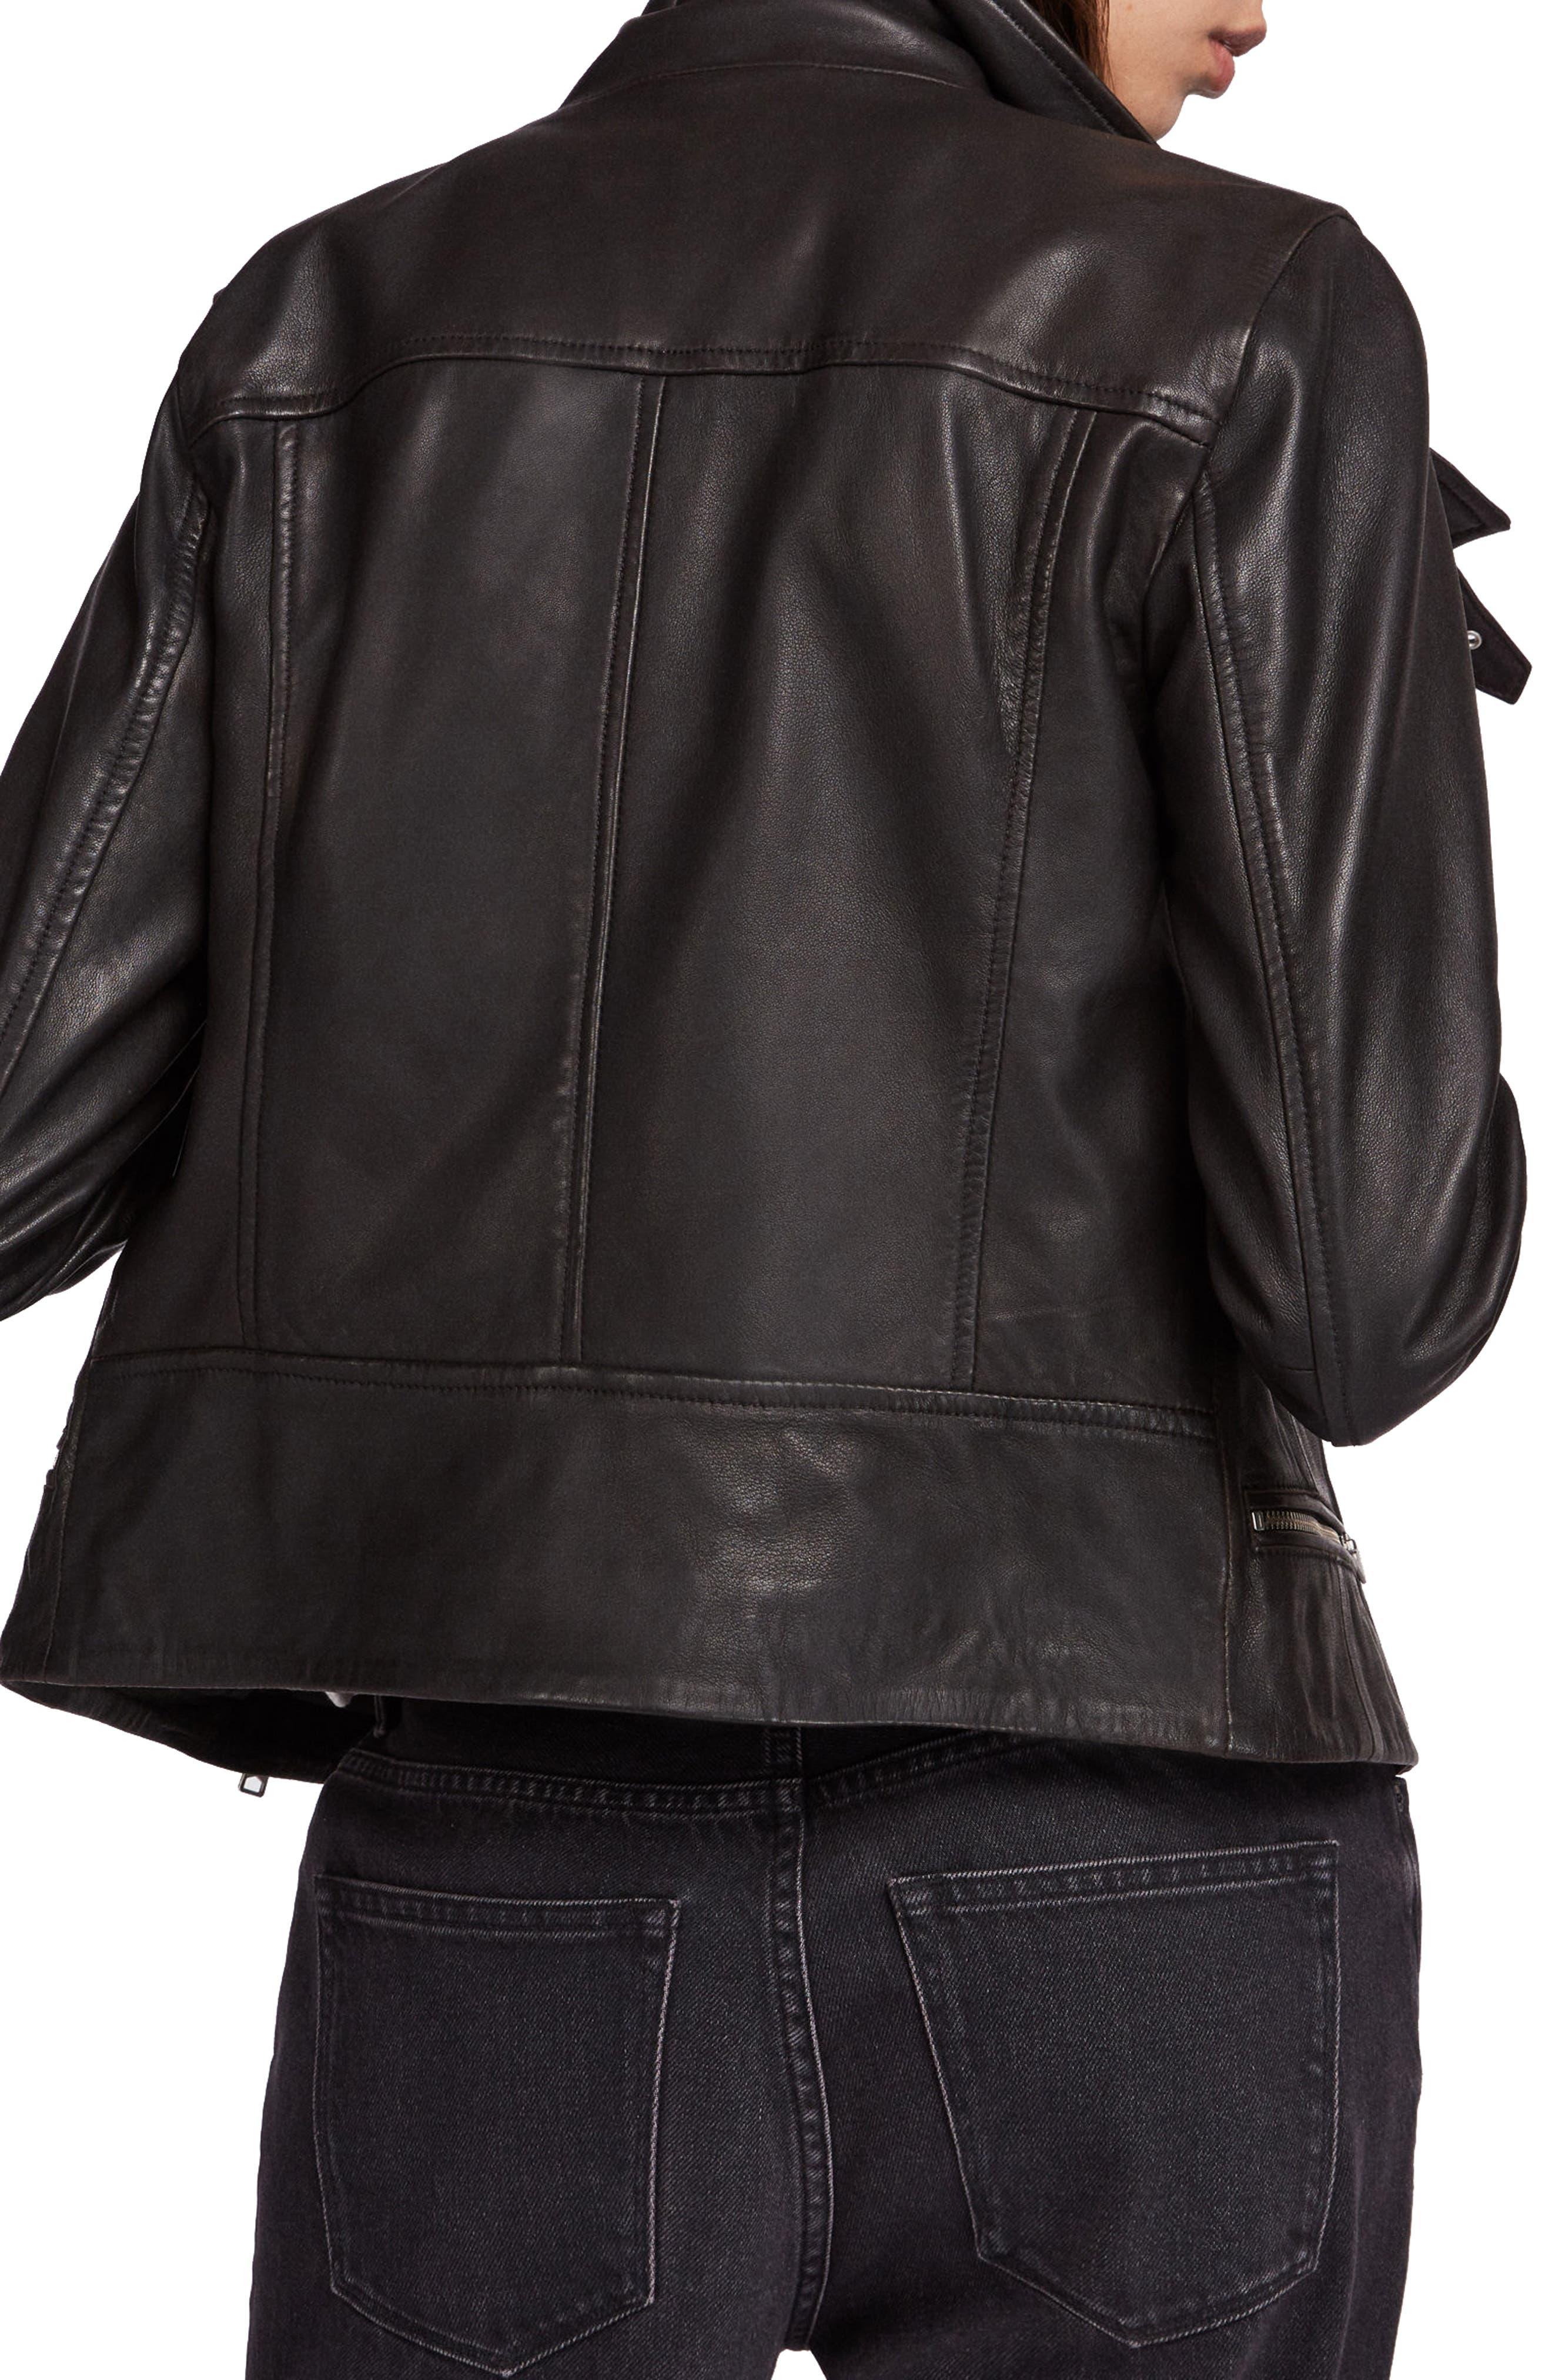 ALLSAINTS, Bales Leather Biker Jacket, Alternate thumbnail 2, color, BLACK